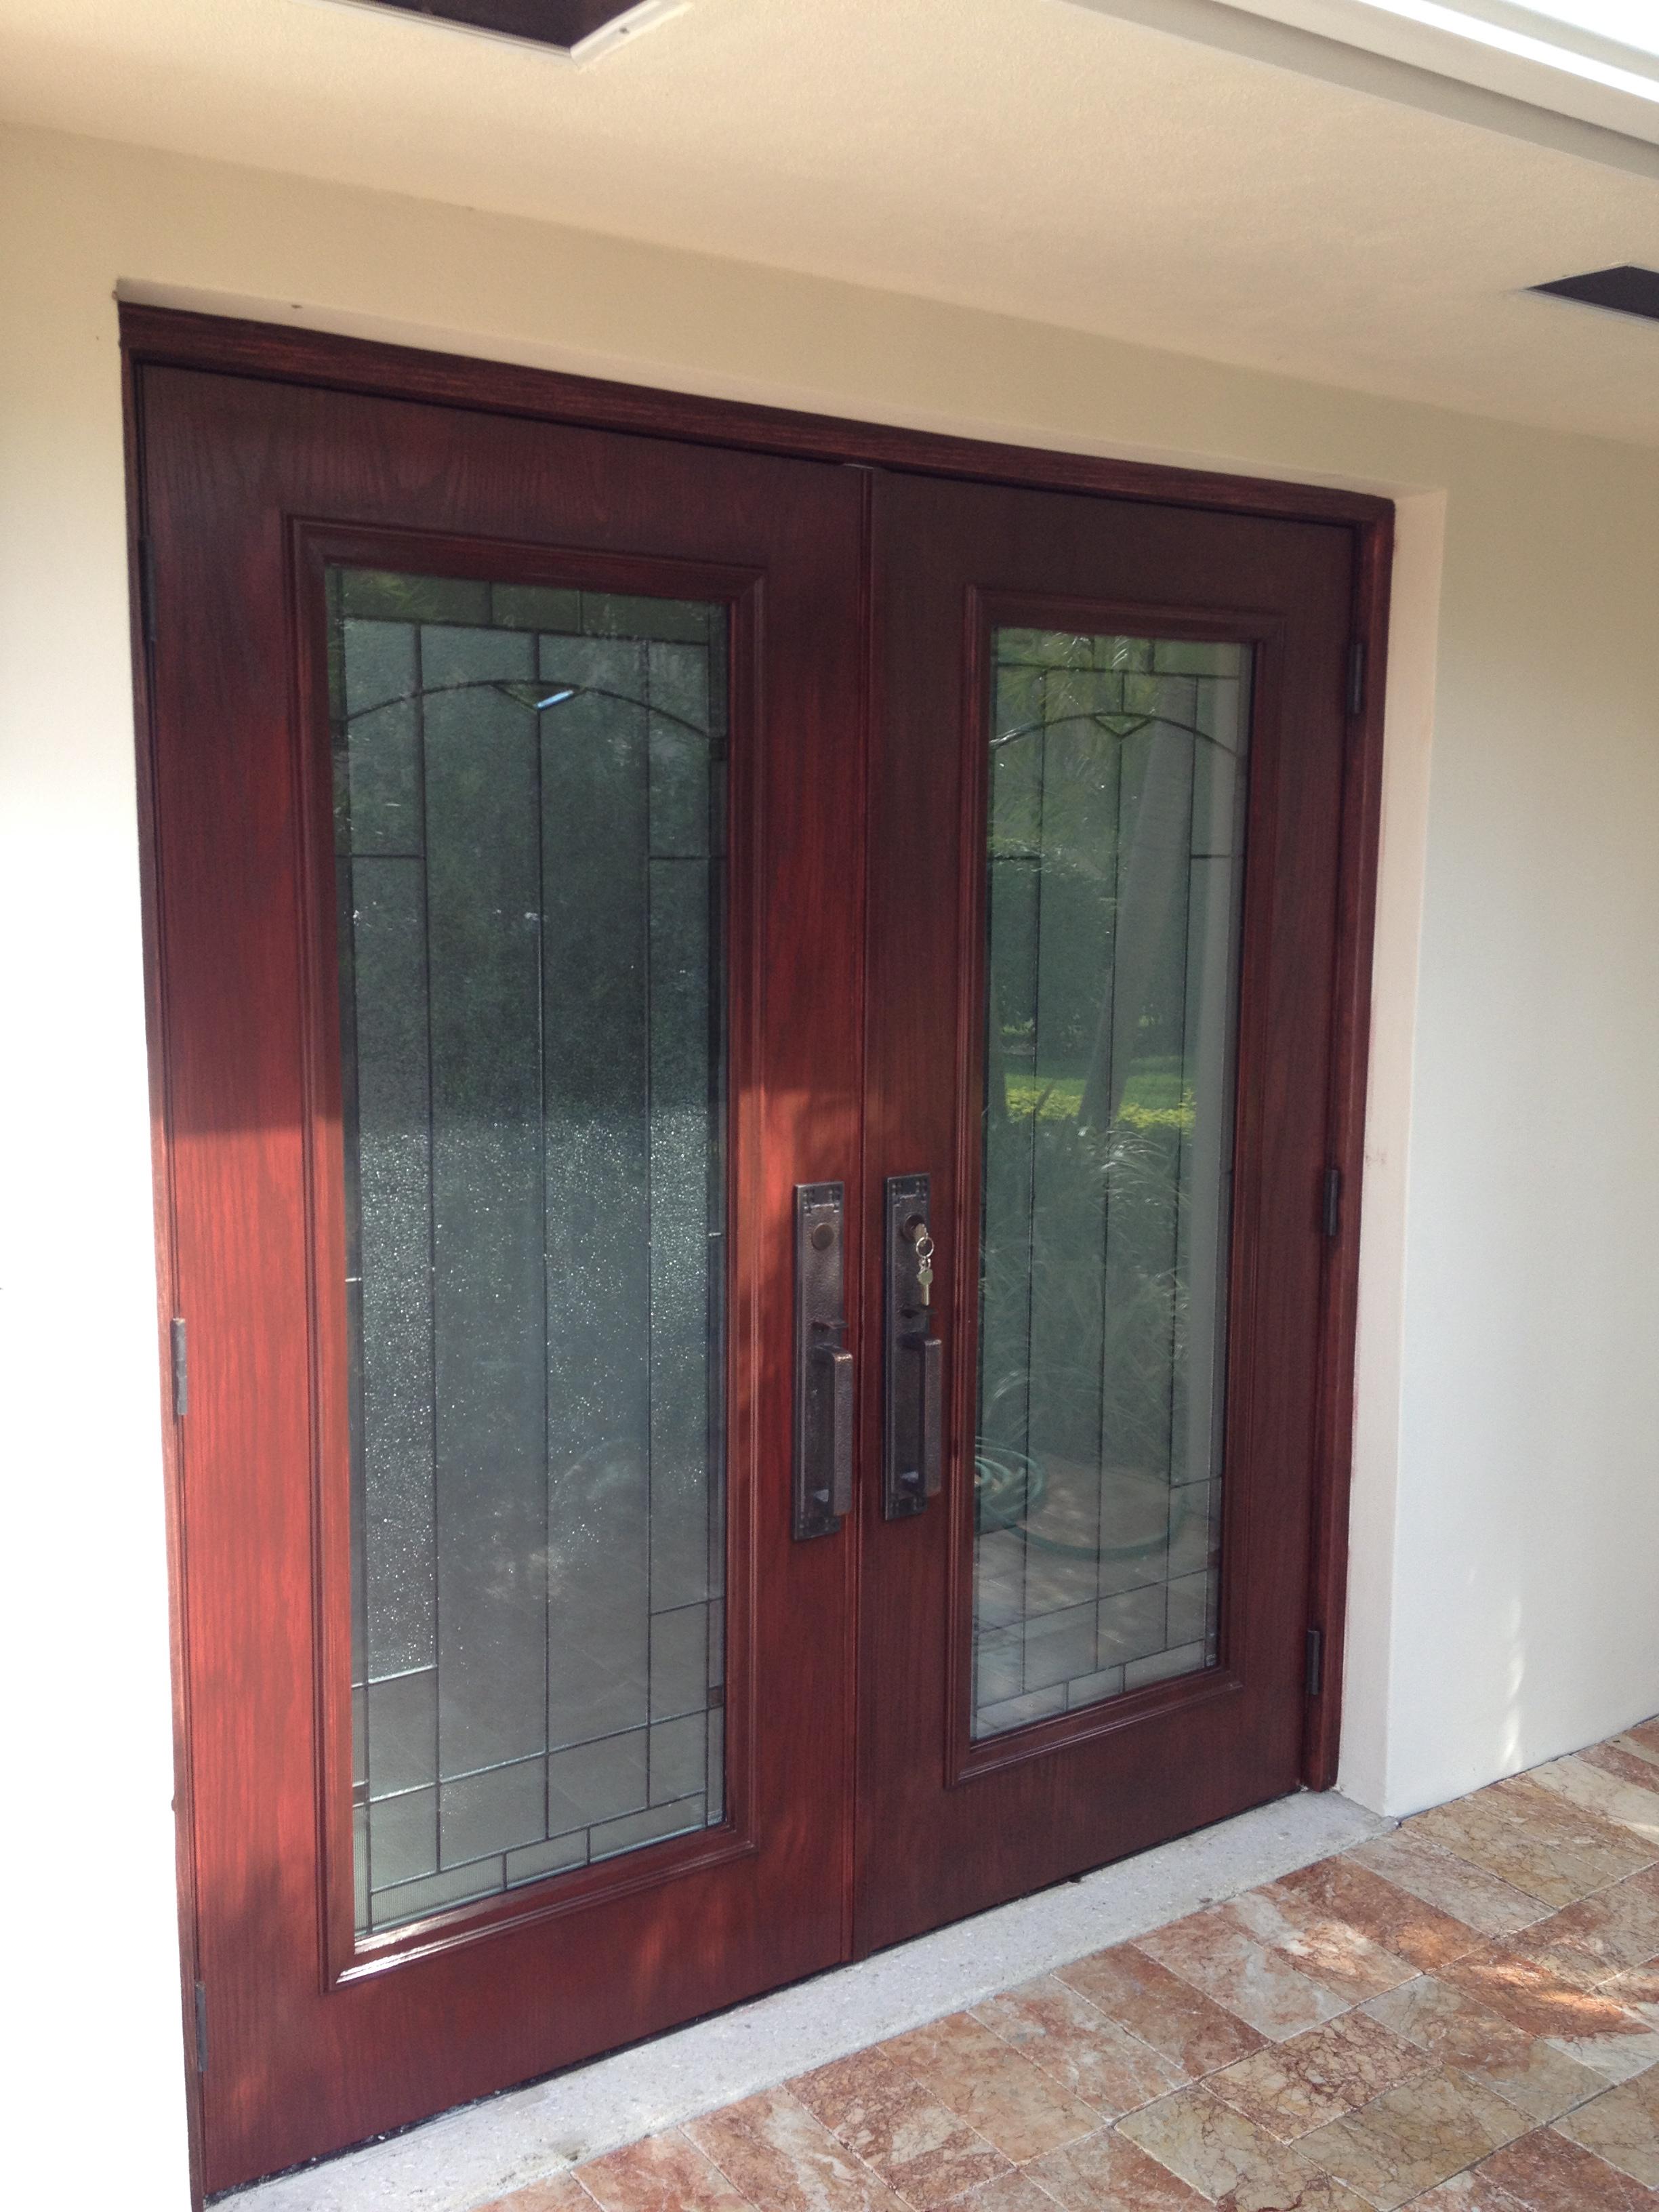 3264 #886A43 Complete Exterior Renovation – Marble Brick Pavers Impact Doors  wallpaper Complete Garage Doors 36252448